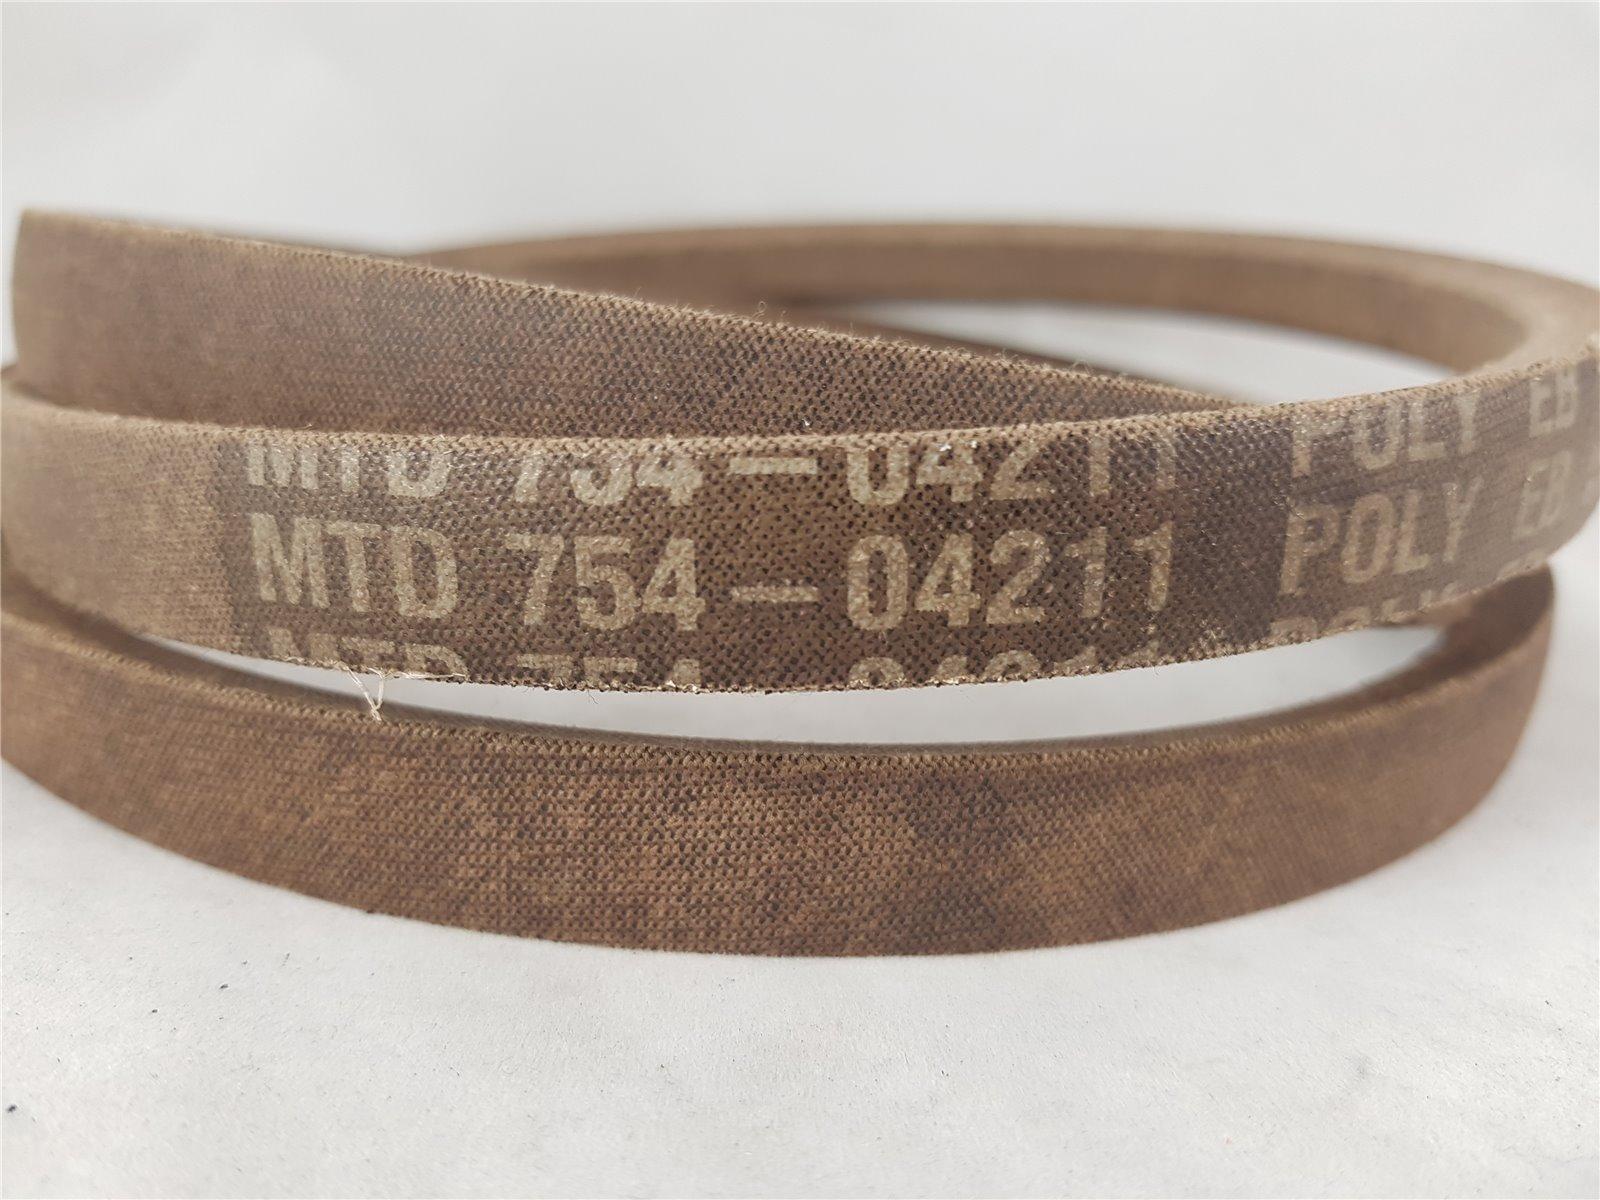 2-1571552-3 Sockel DIP PIN 14 7,62mm gold flash Polyester ØAusg